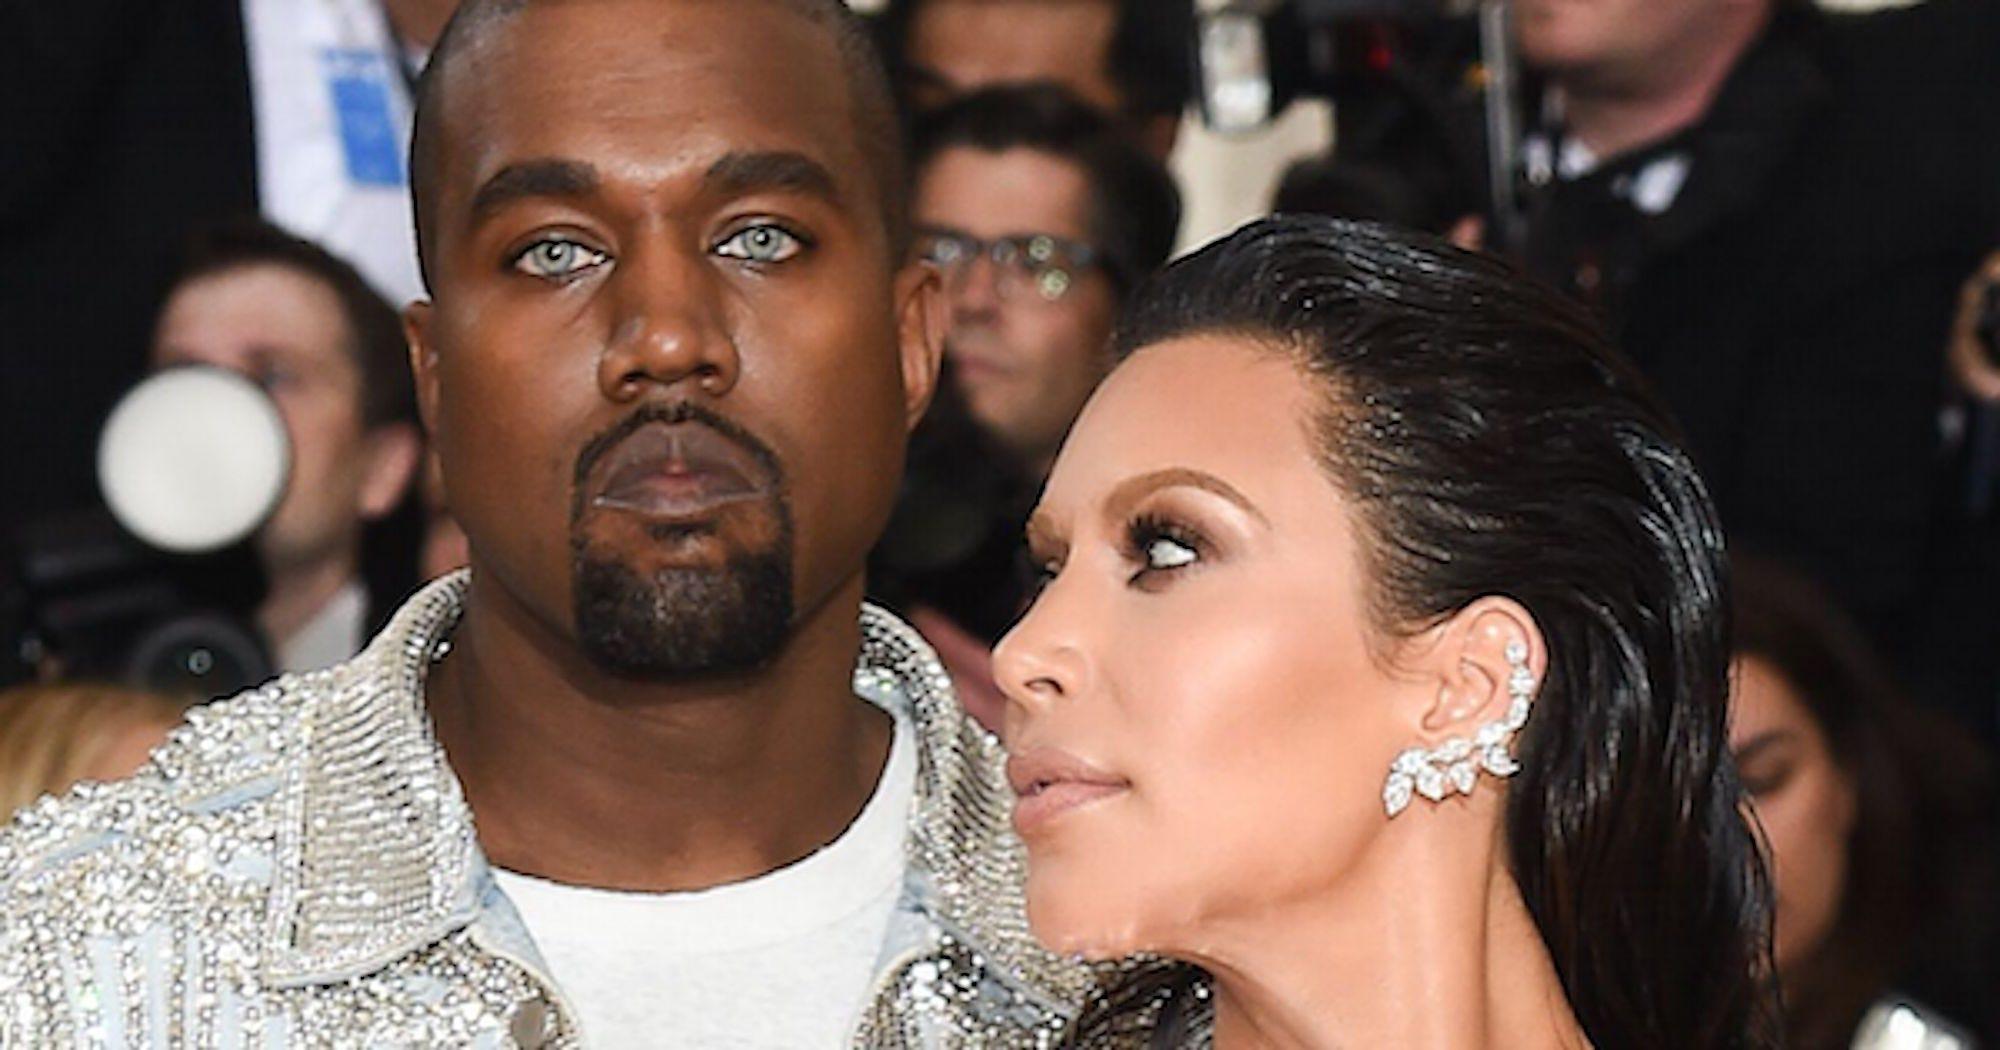 Kanye West Compares Kim Kardashian To... O.J. Simpson?